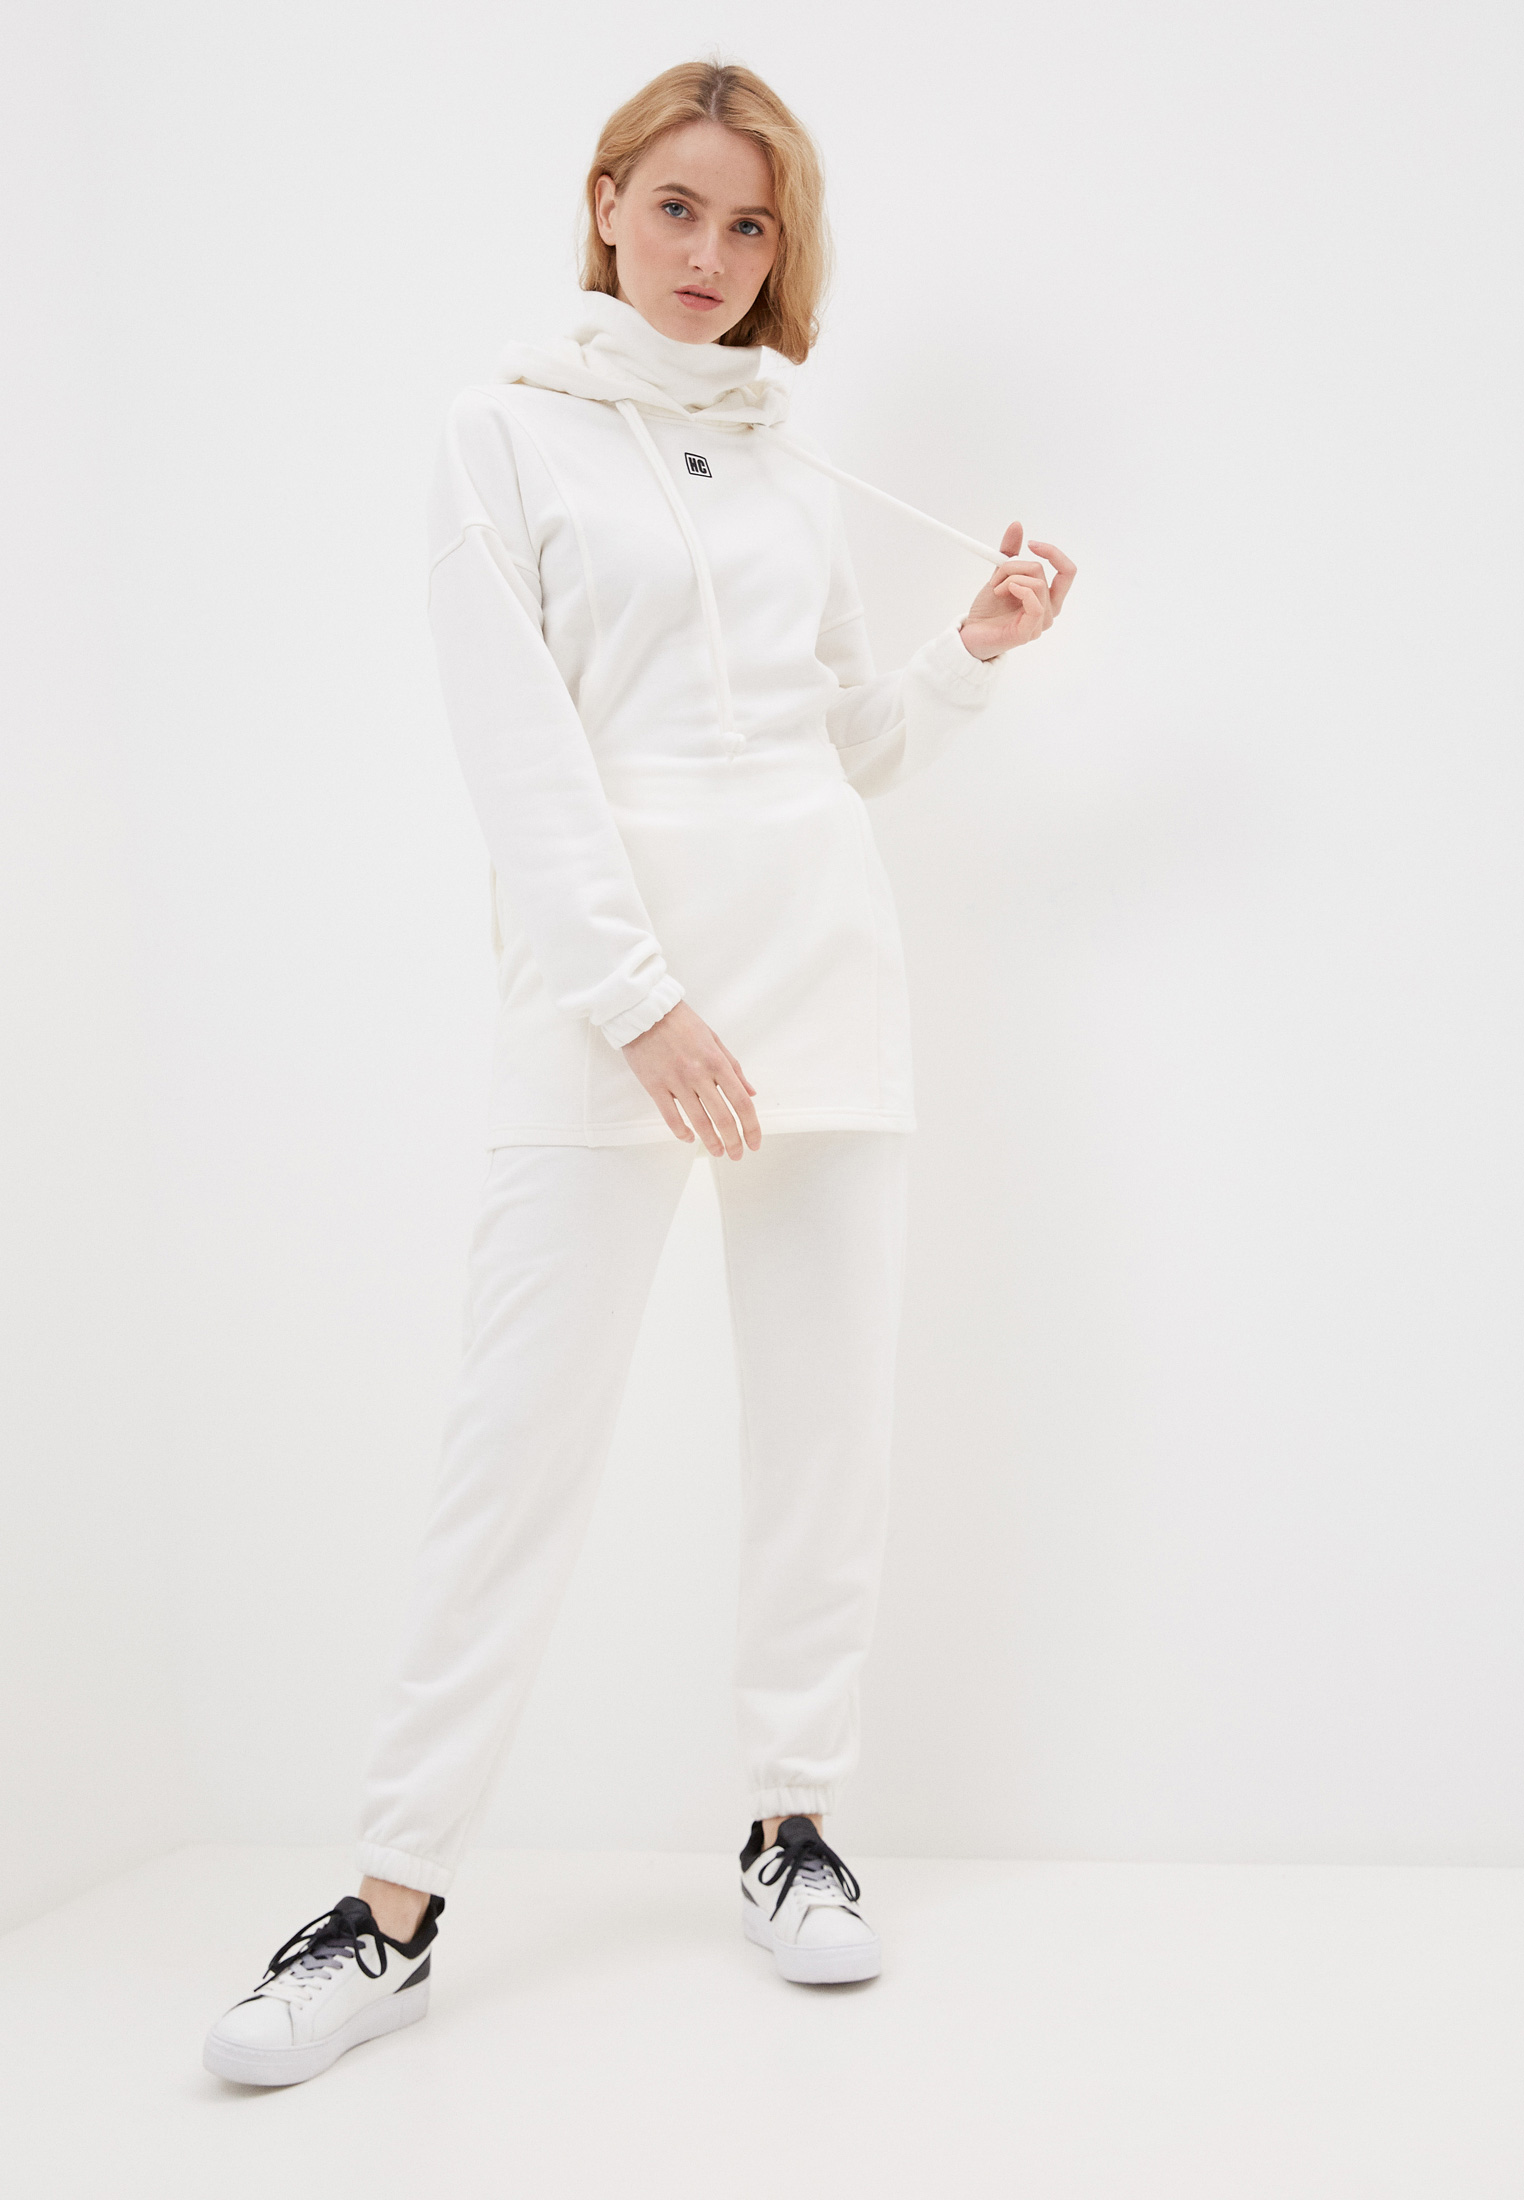 Спортивный костюм Sitlly 21348